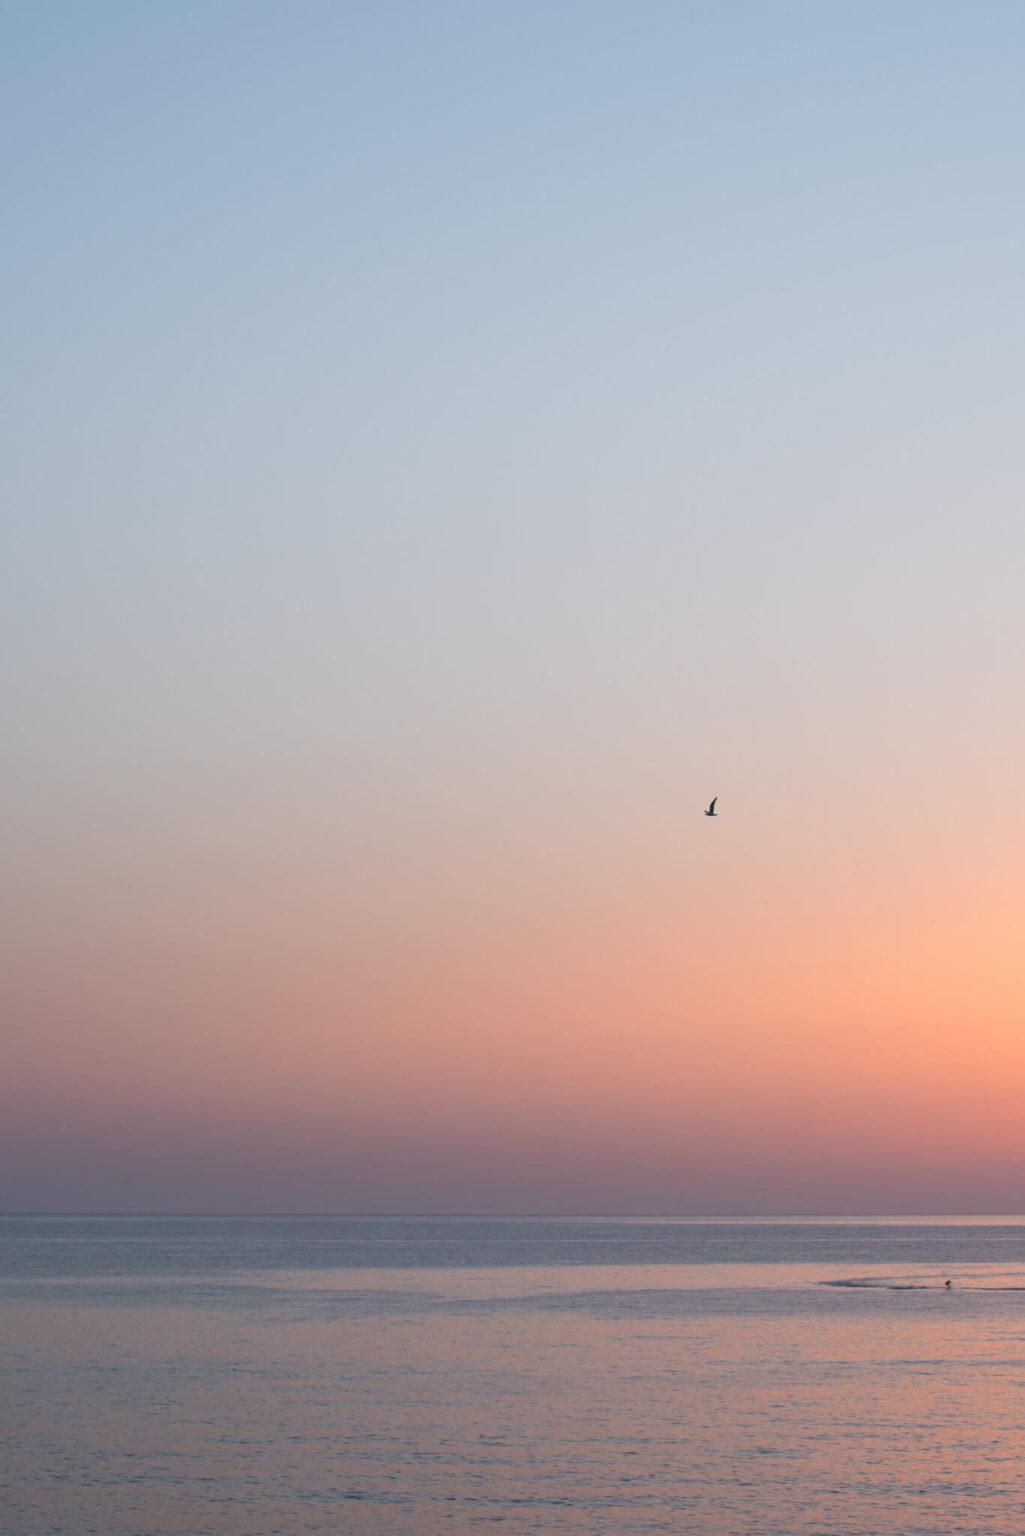 https://www.white-ibiza.com/wp-content/uploads/2020/03/formentera-sunsets-2020-07-1025x1536.jpg